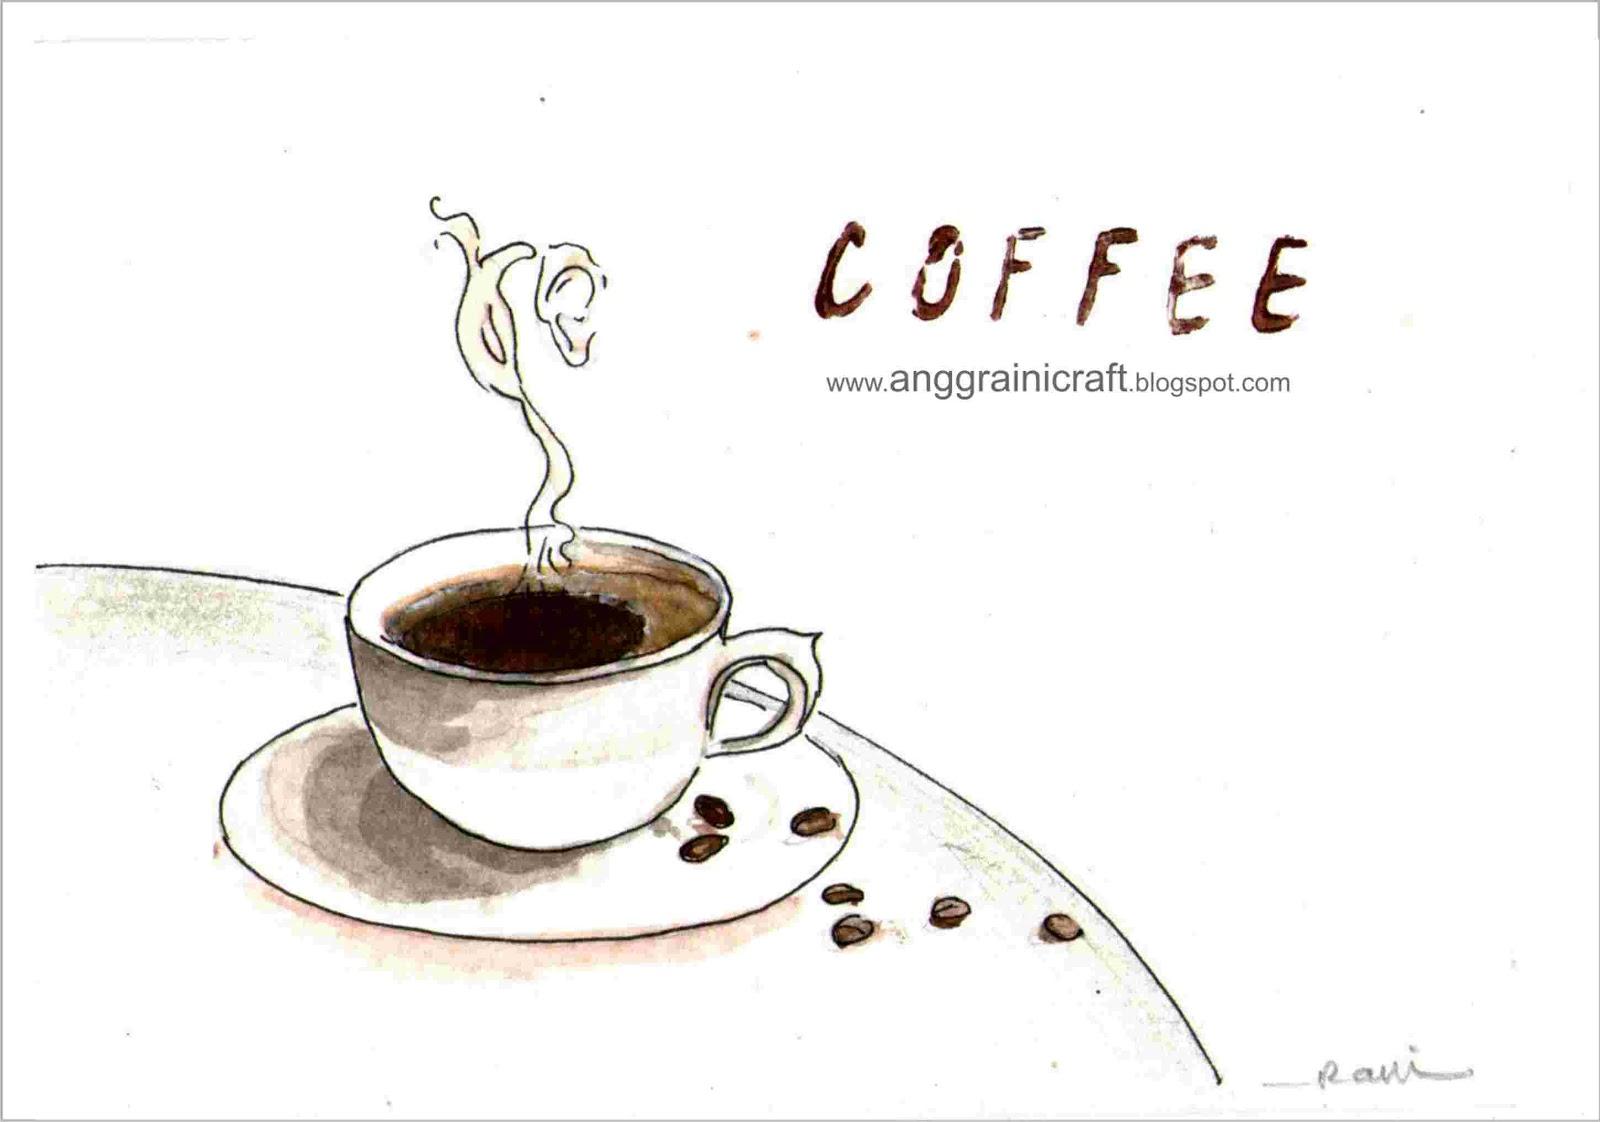 174 Gambar Sketsa Coffee